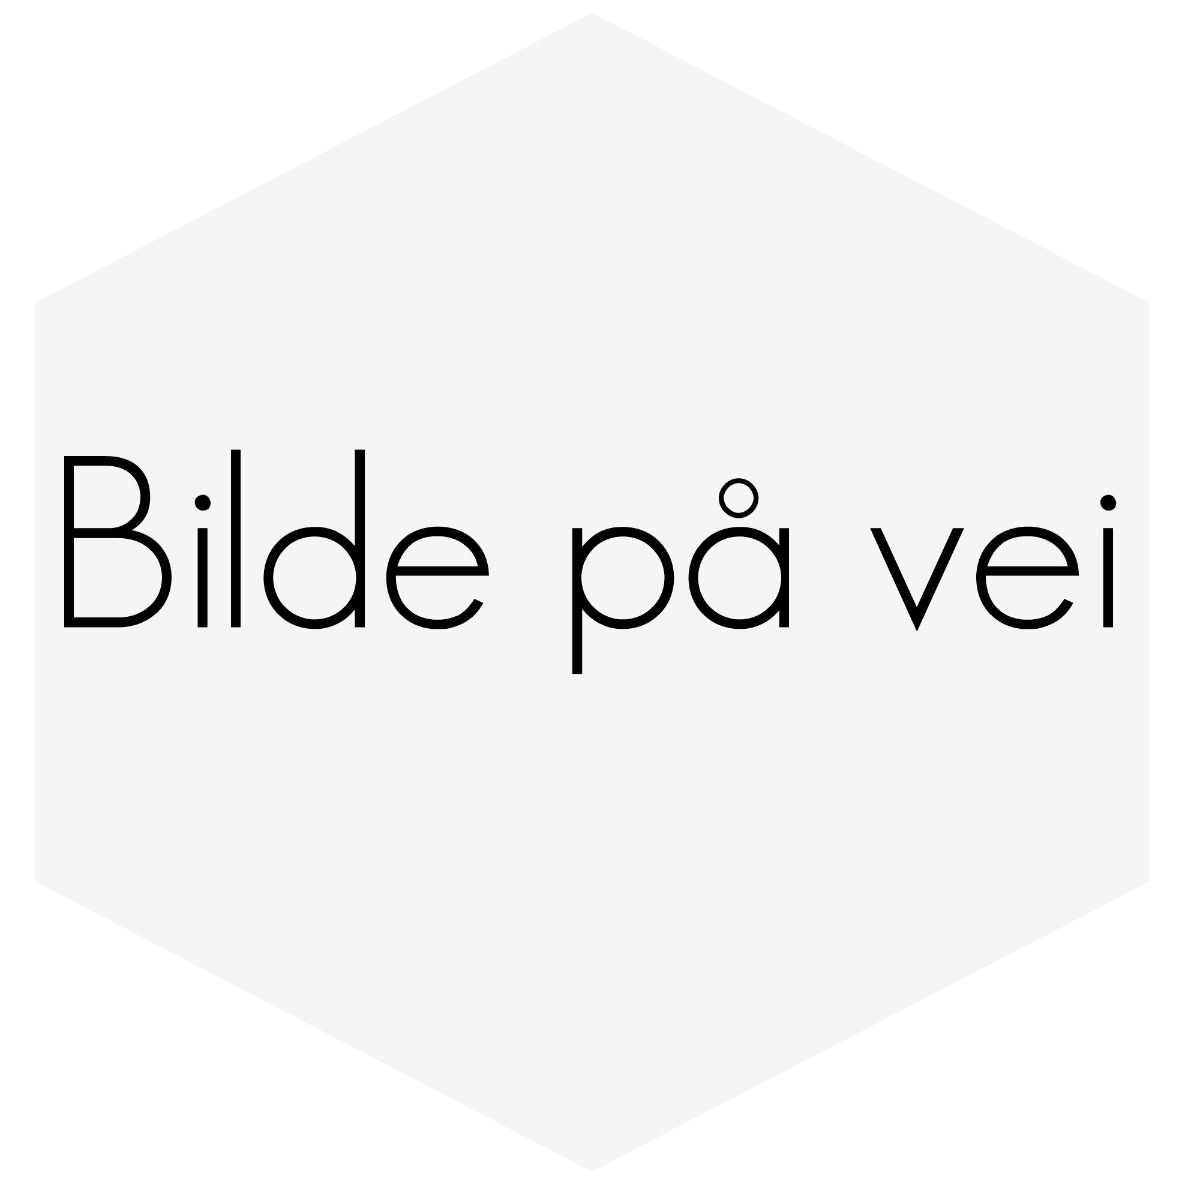 BREMSEKLOSSER FORAN TIL VOLVO V50/S40 +FLER SE INFO